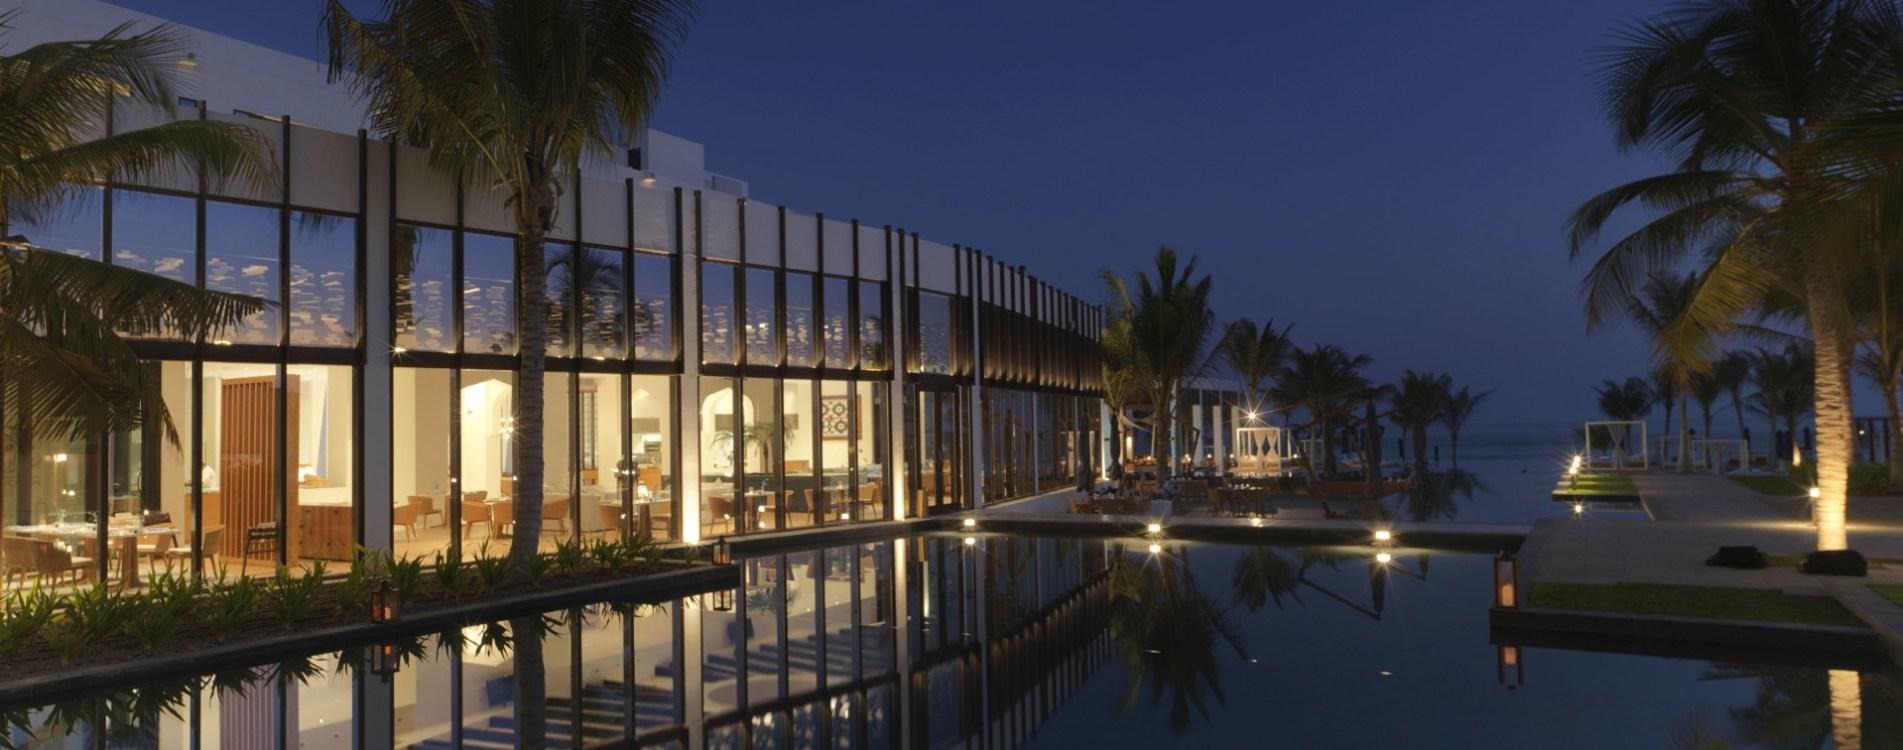 Al-Baleed-Resort-Salalah-By-Anantara-Exterior-Nacht-Pool-Oman.jpg